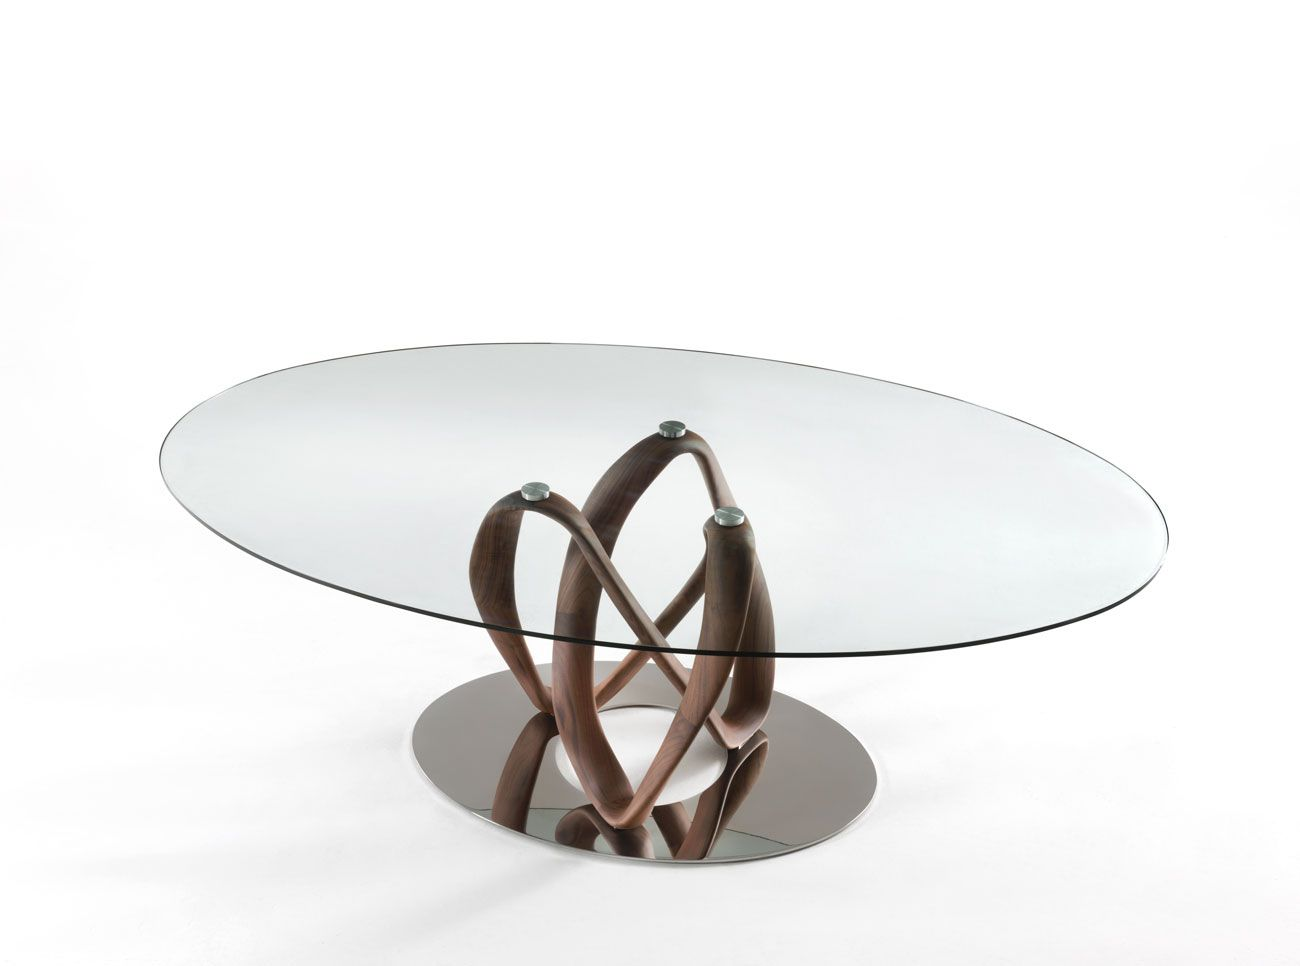 Infinity Table 2 0 Design Stefano Bigi For Porada [ 966 x 1300 Pixel ]